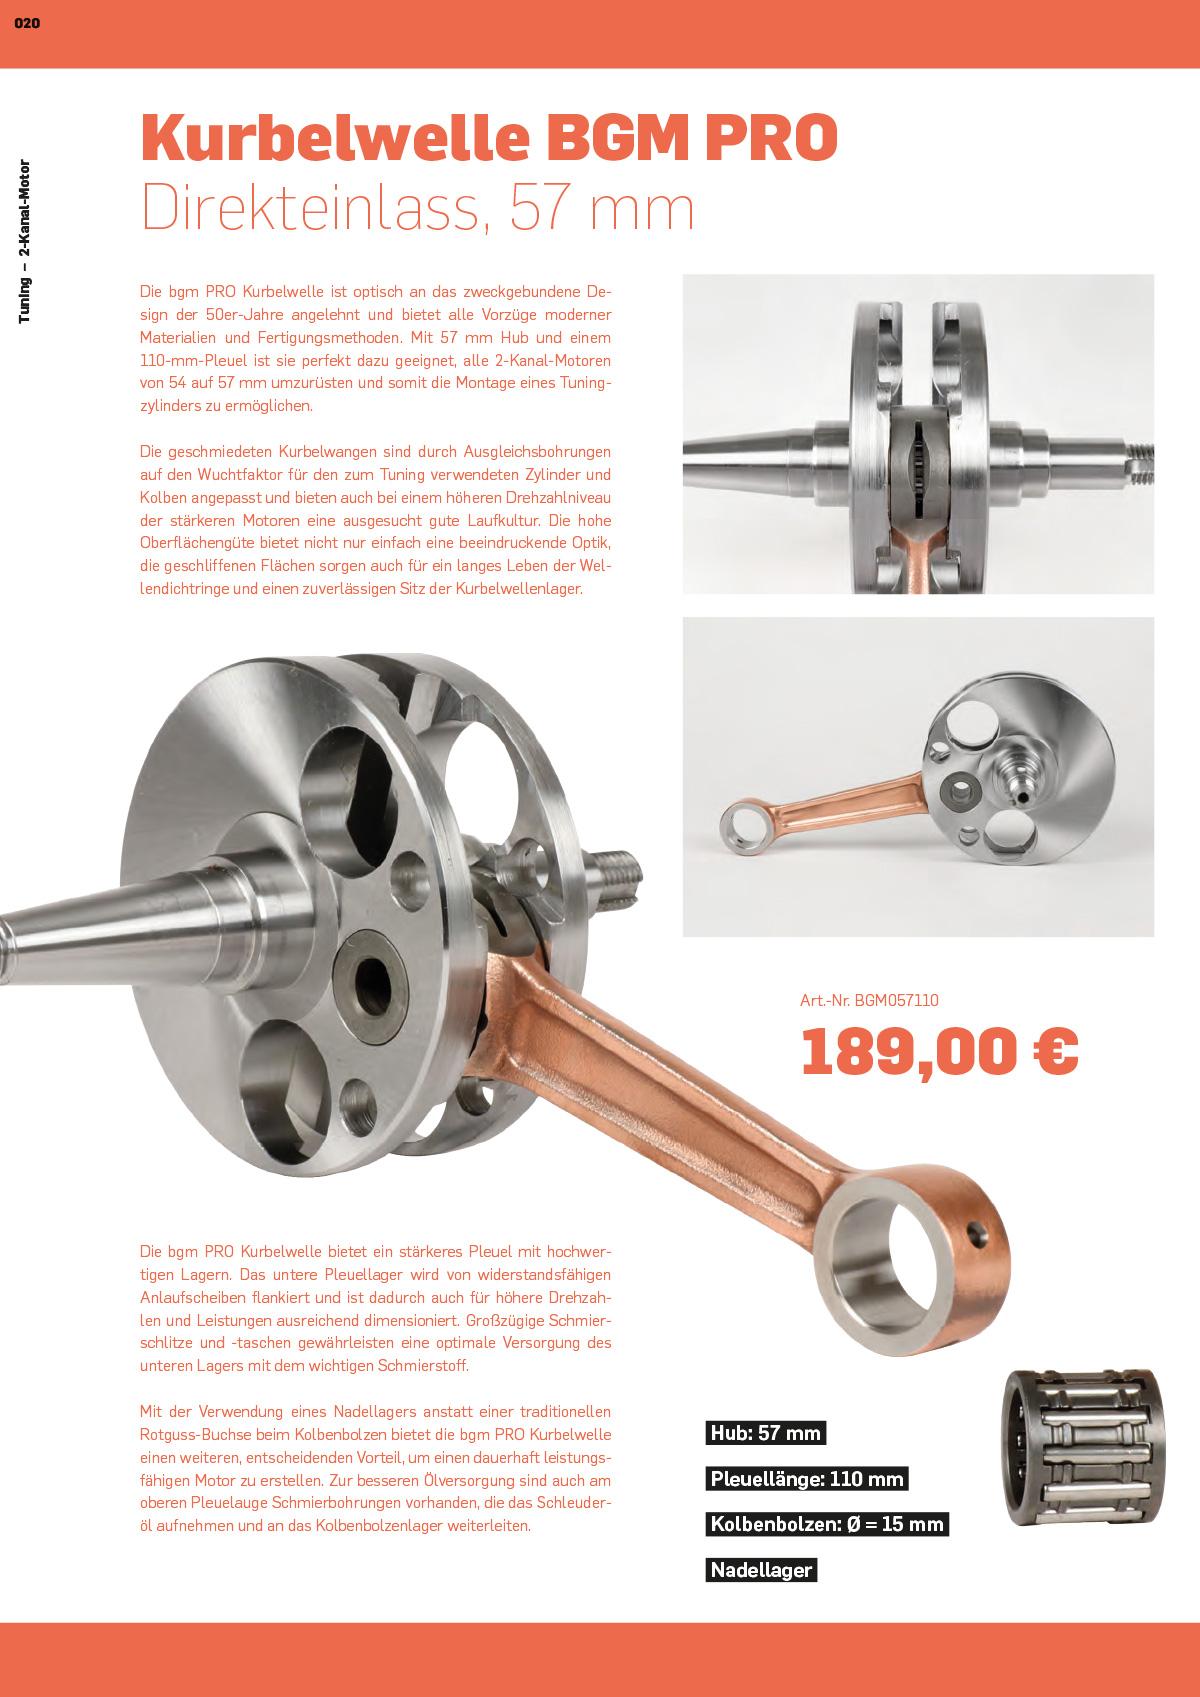 Vespa Wideframe Tuning Kurbelwelle im Vespa Katalog